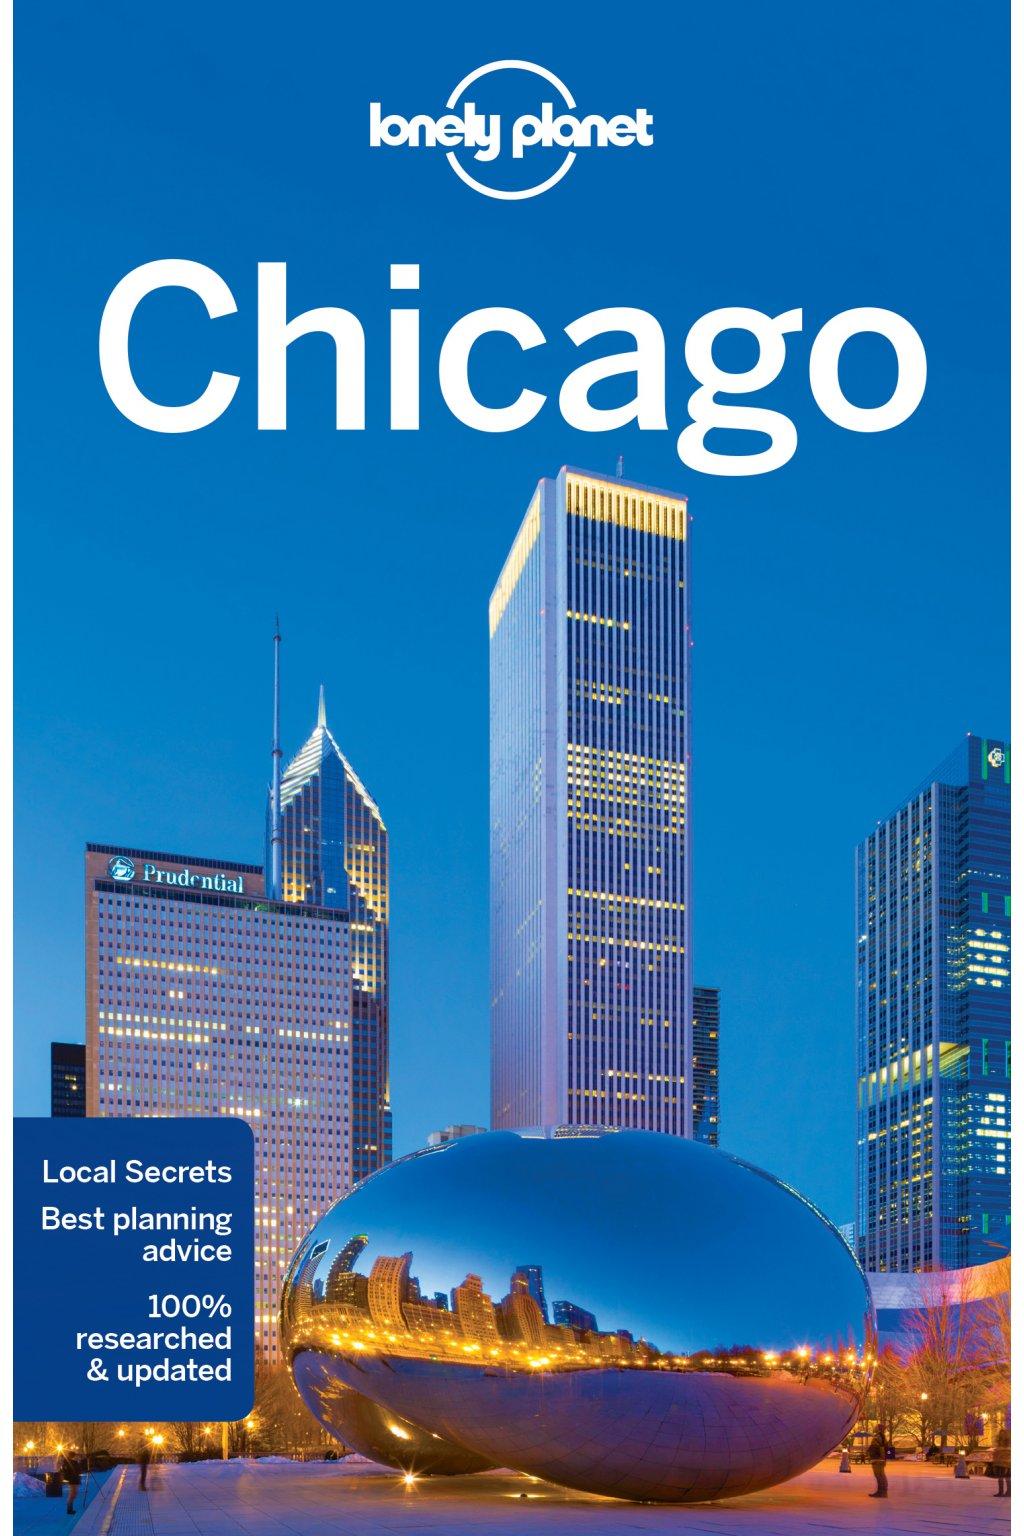 55278 Chicago 8 tg 9781786572271